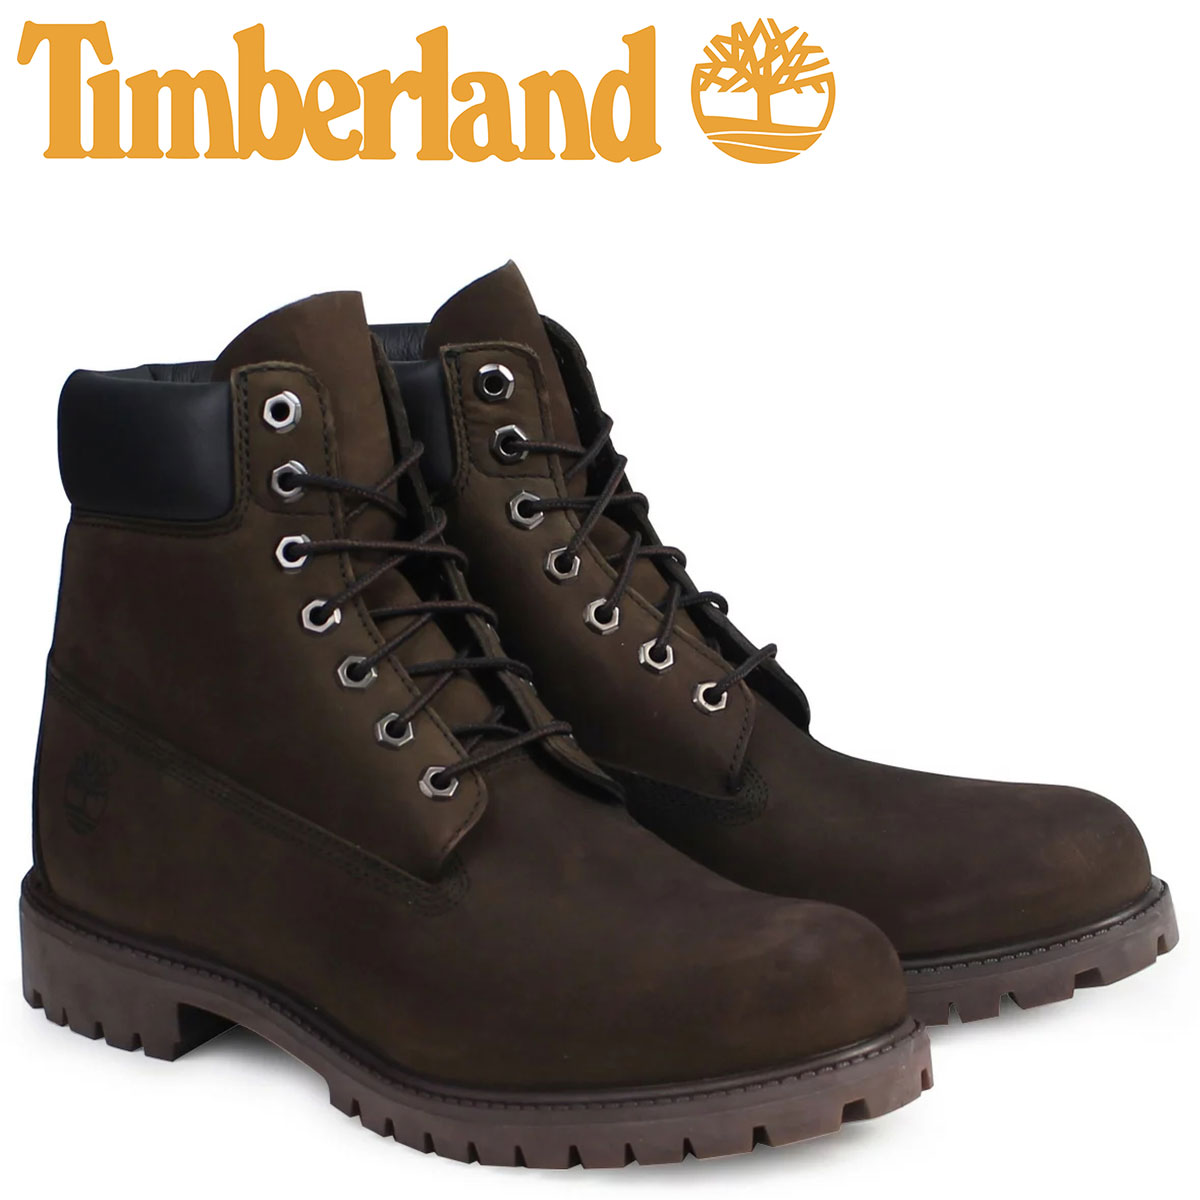 37726027cc3 6 inches of Timberland boots men Timberland 6INCH PREMIUM WATERPROOF BOOTS  premium waterproof nubuck waterproofing 10001 dark chocolate